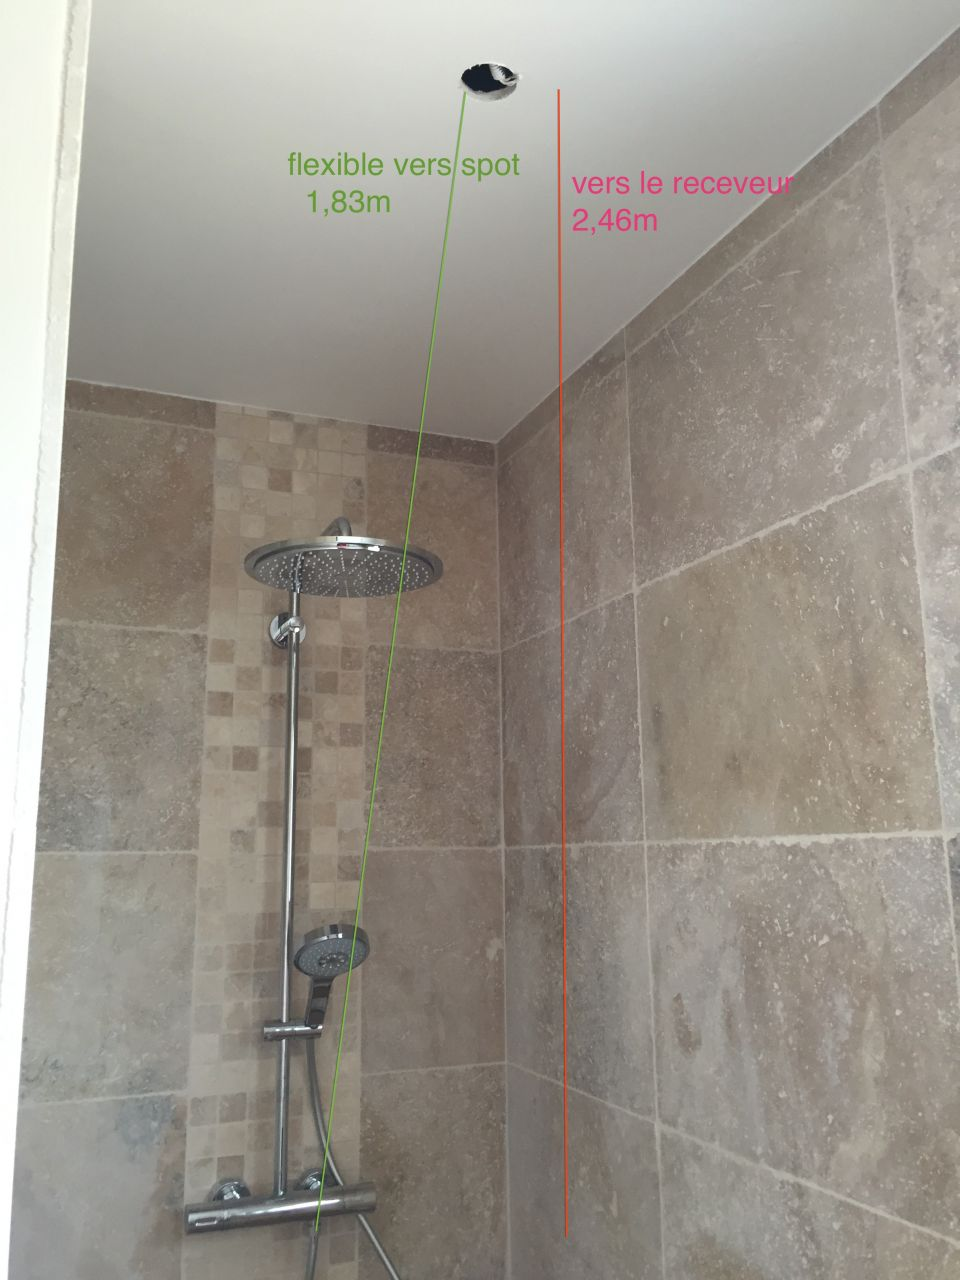 Salle bain et volume 6 messages - Volume salle de bain ...